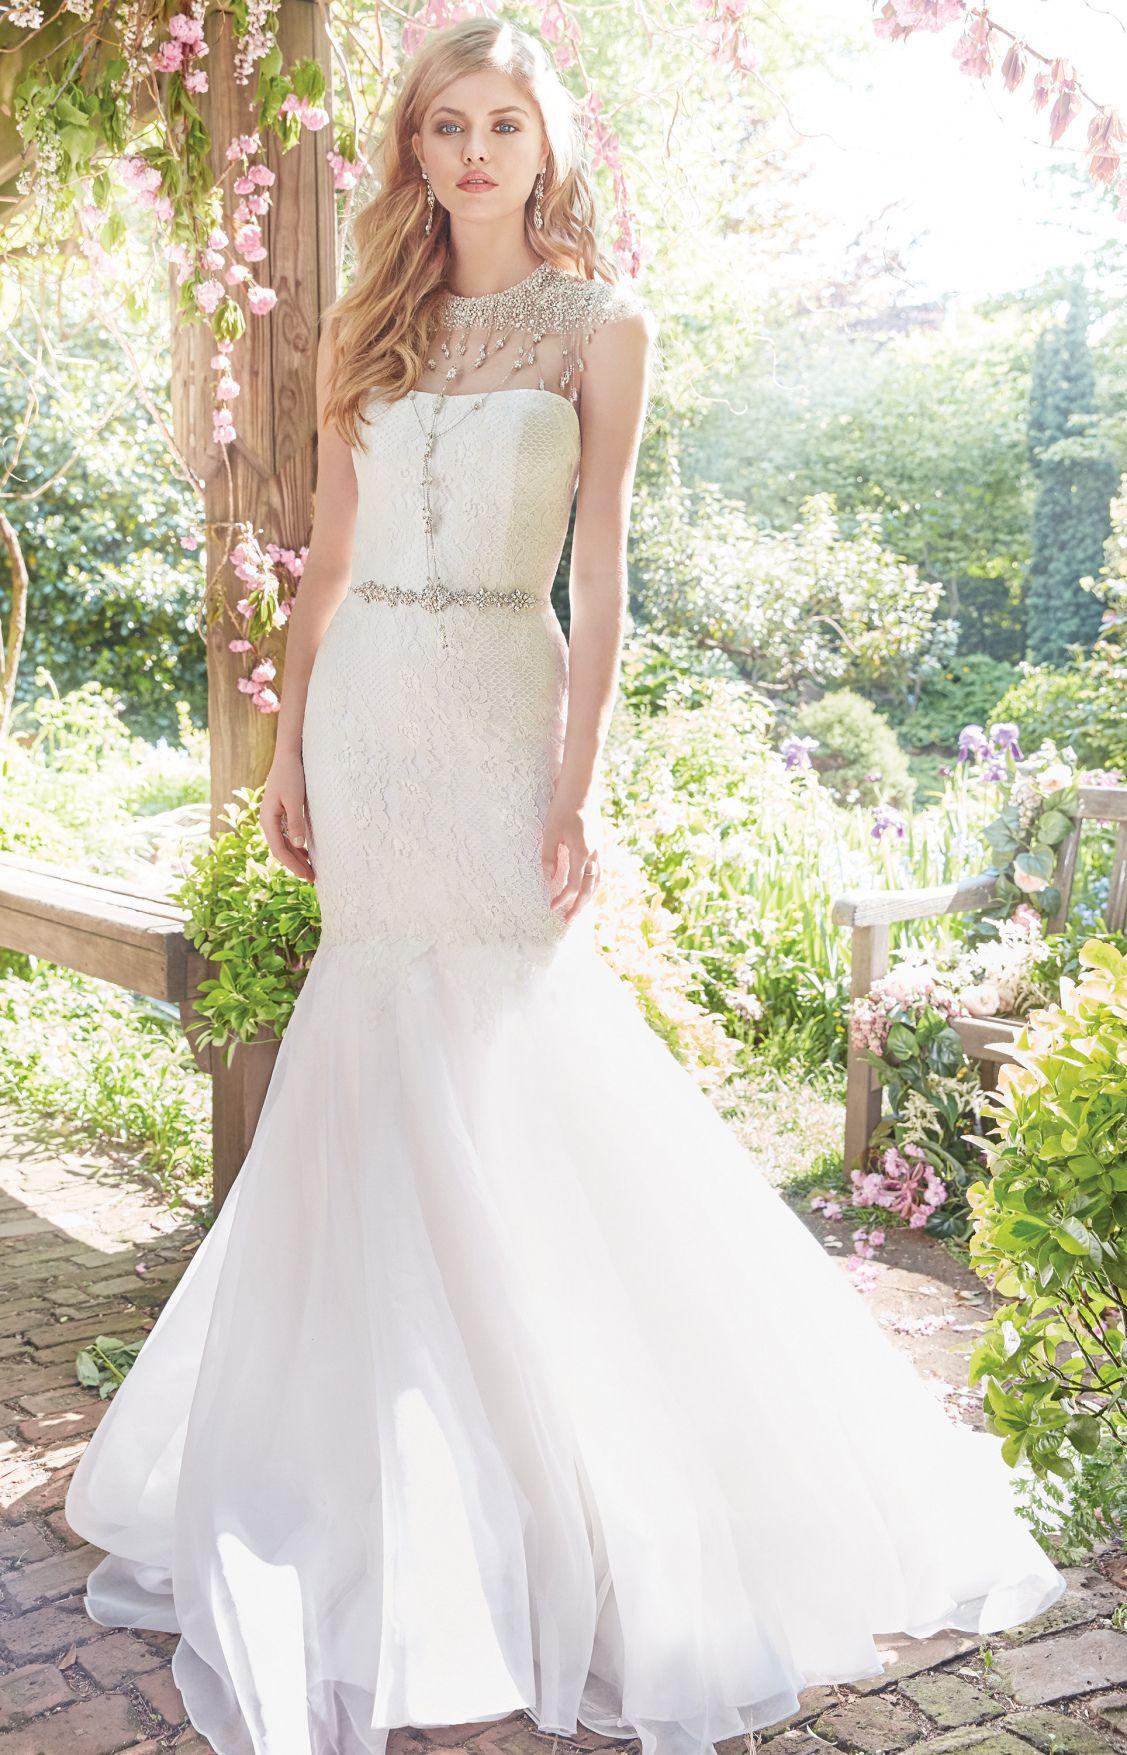 2019 Wedding Dresses Roanoke Va Best Wedding Dress For Pear Shaped Check More At Http Svesty Com Wedding Dresses Roanoke Va